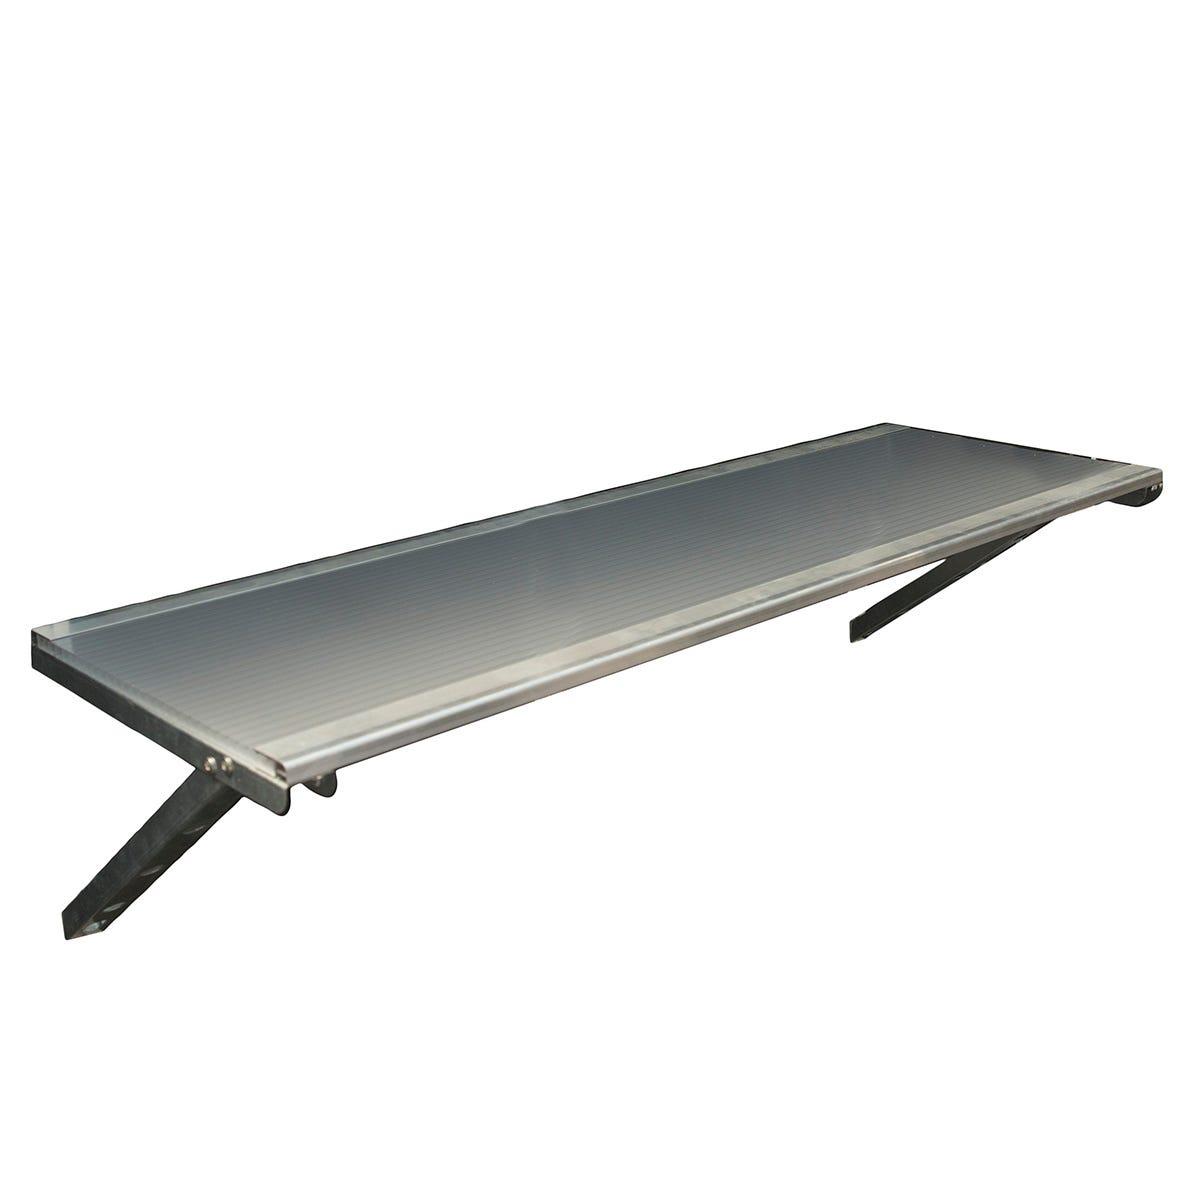 Palram Utility Shed Shelf Kit